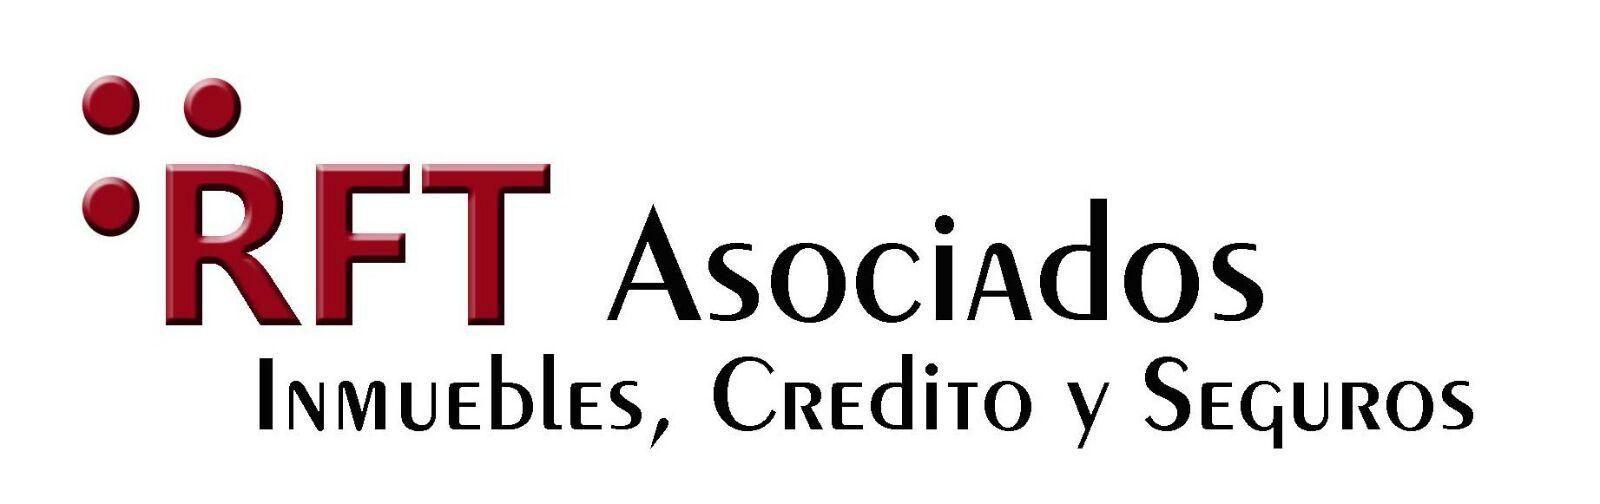 Logo de  Daniel Rios Gonzalez          (crm-4748-193)